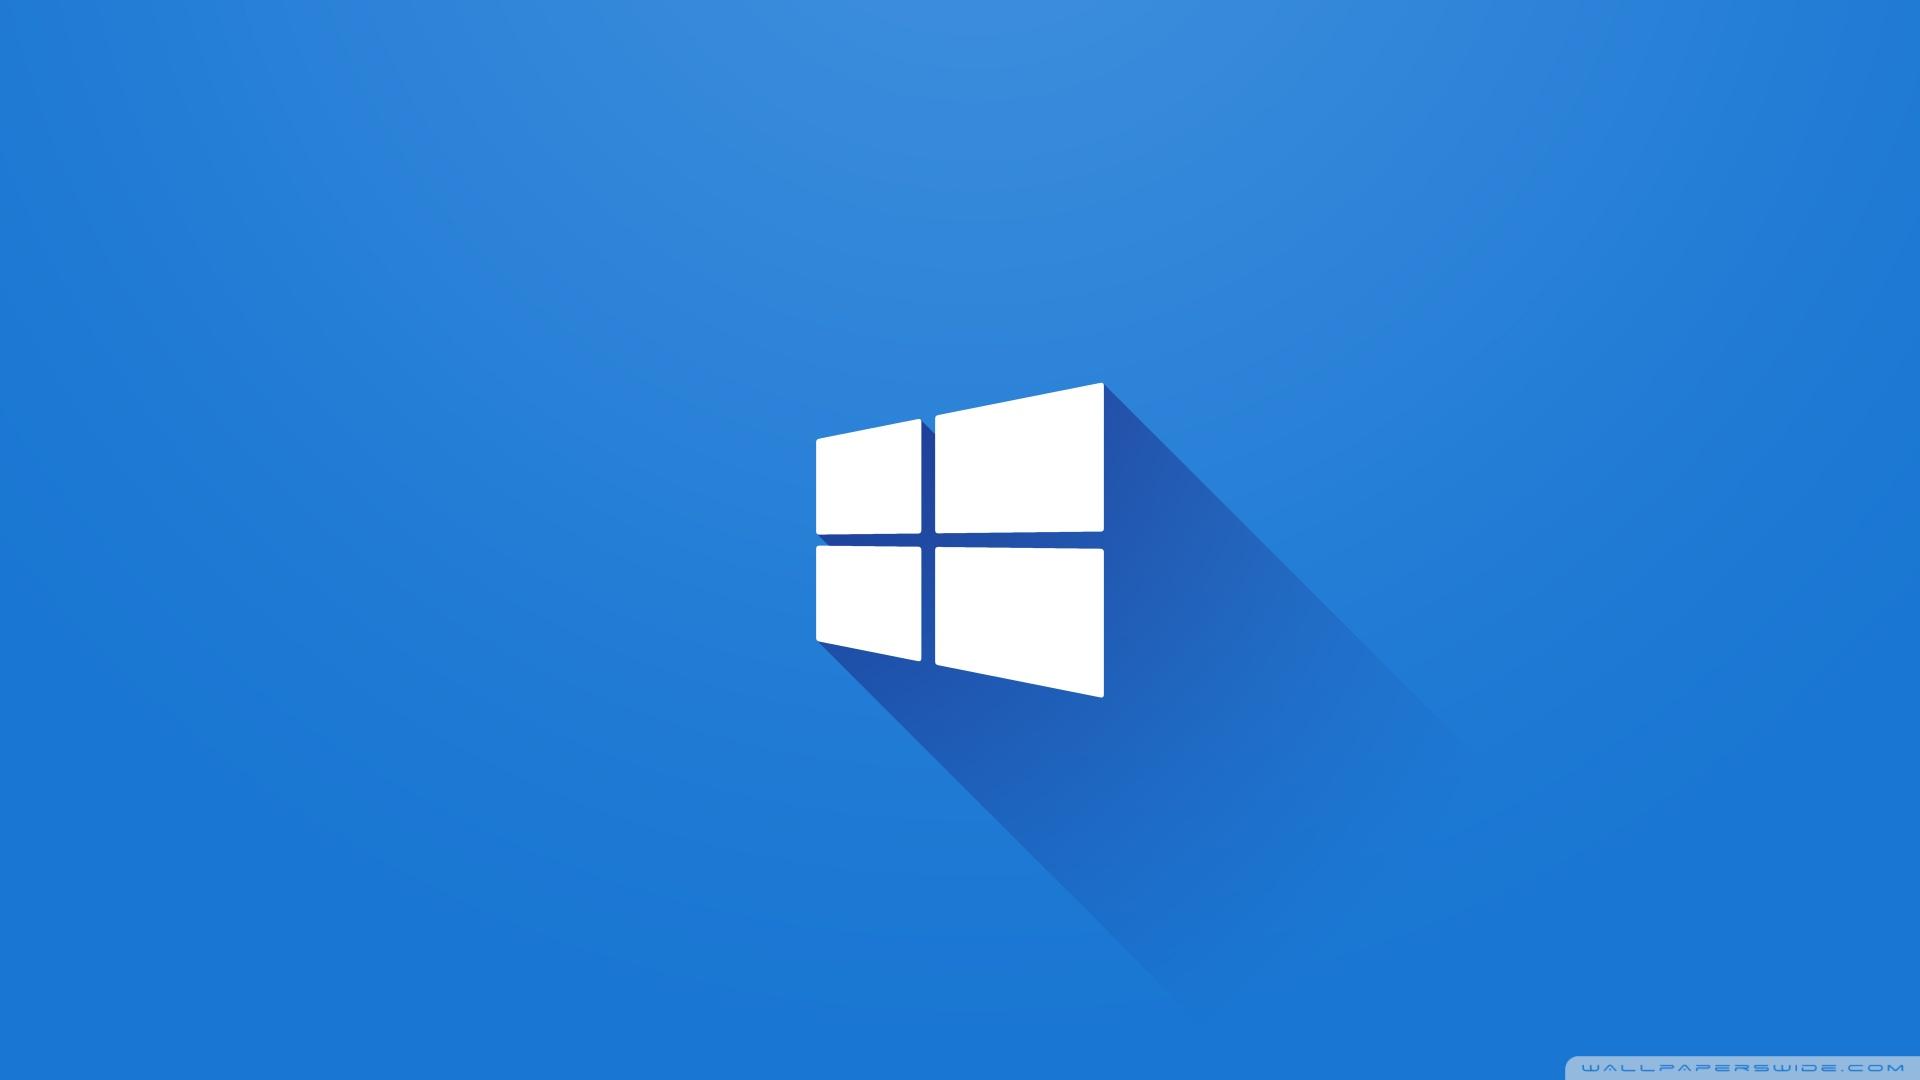 Windows 10 Mobile Build 10512 Screenshots Leak Online 1920x1080